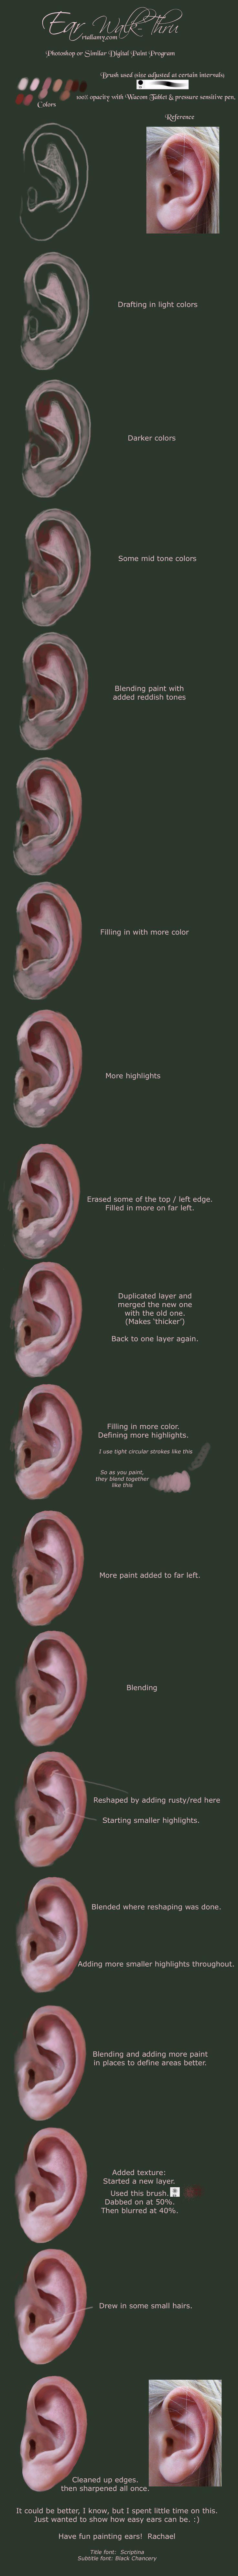 Painting Ear Walk-thru by Rach-Resources